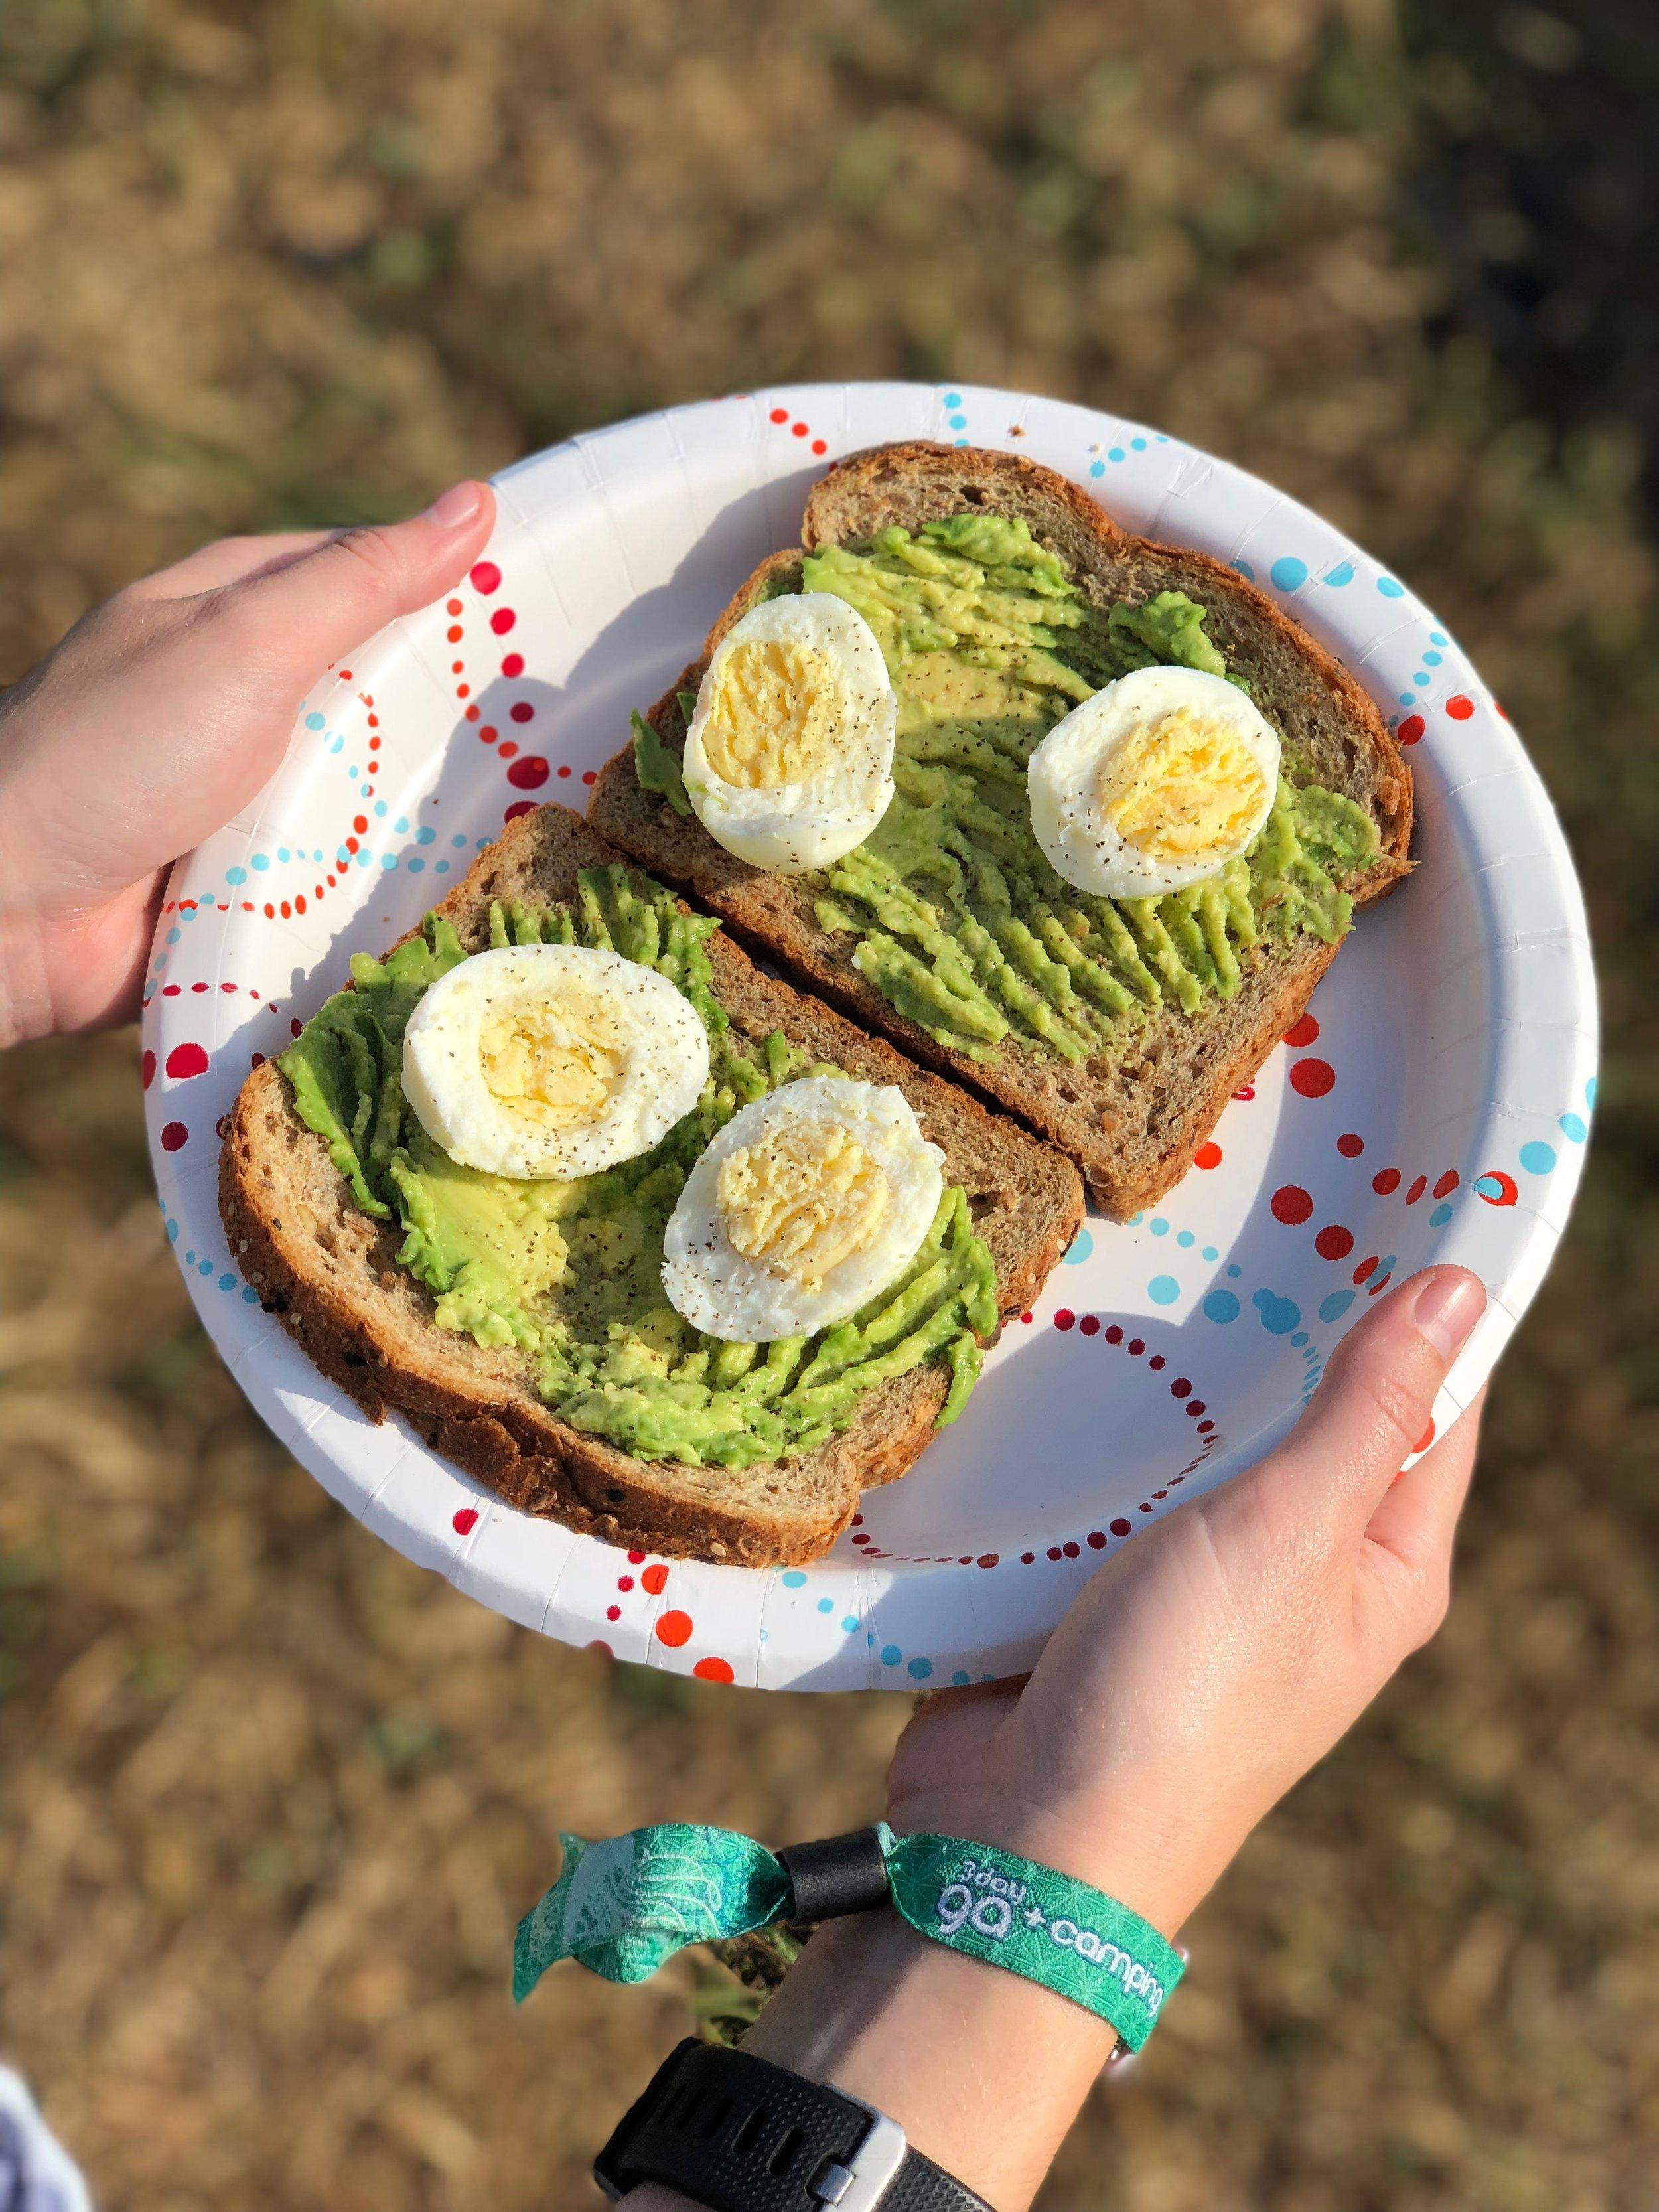 Whole grain bread, avocado, hard boiled eggs